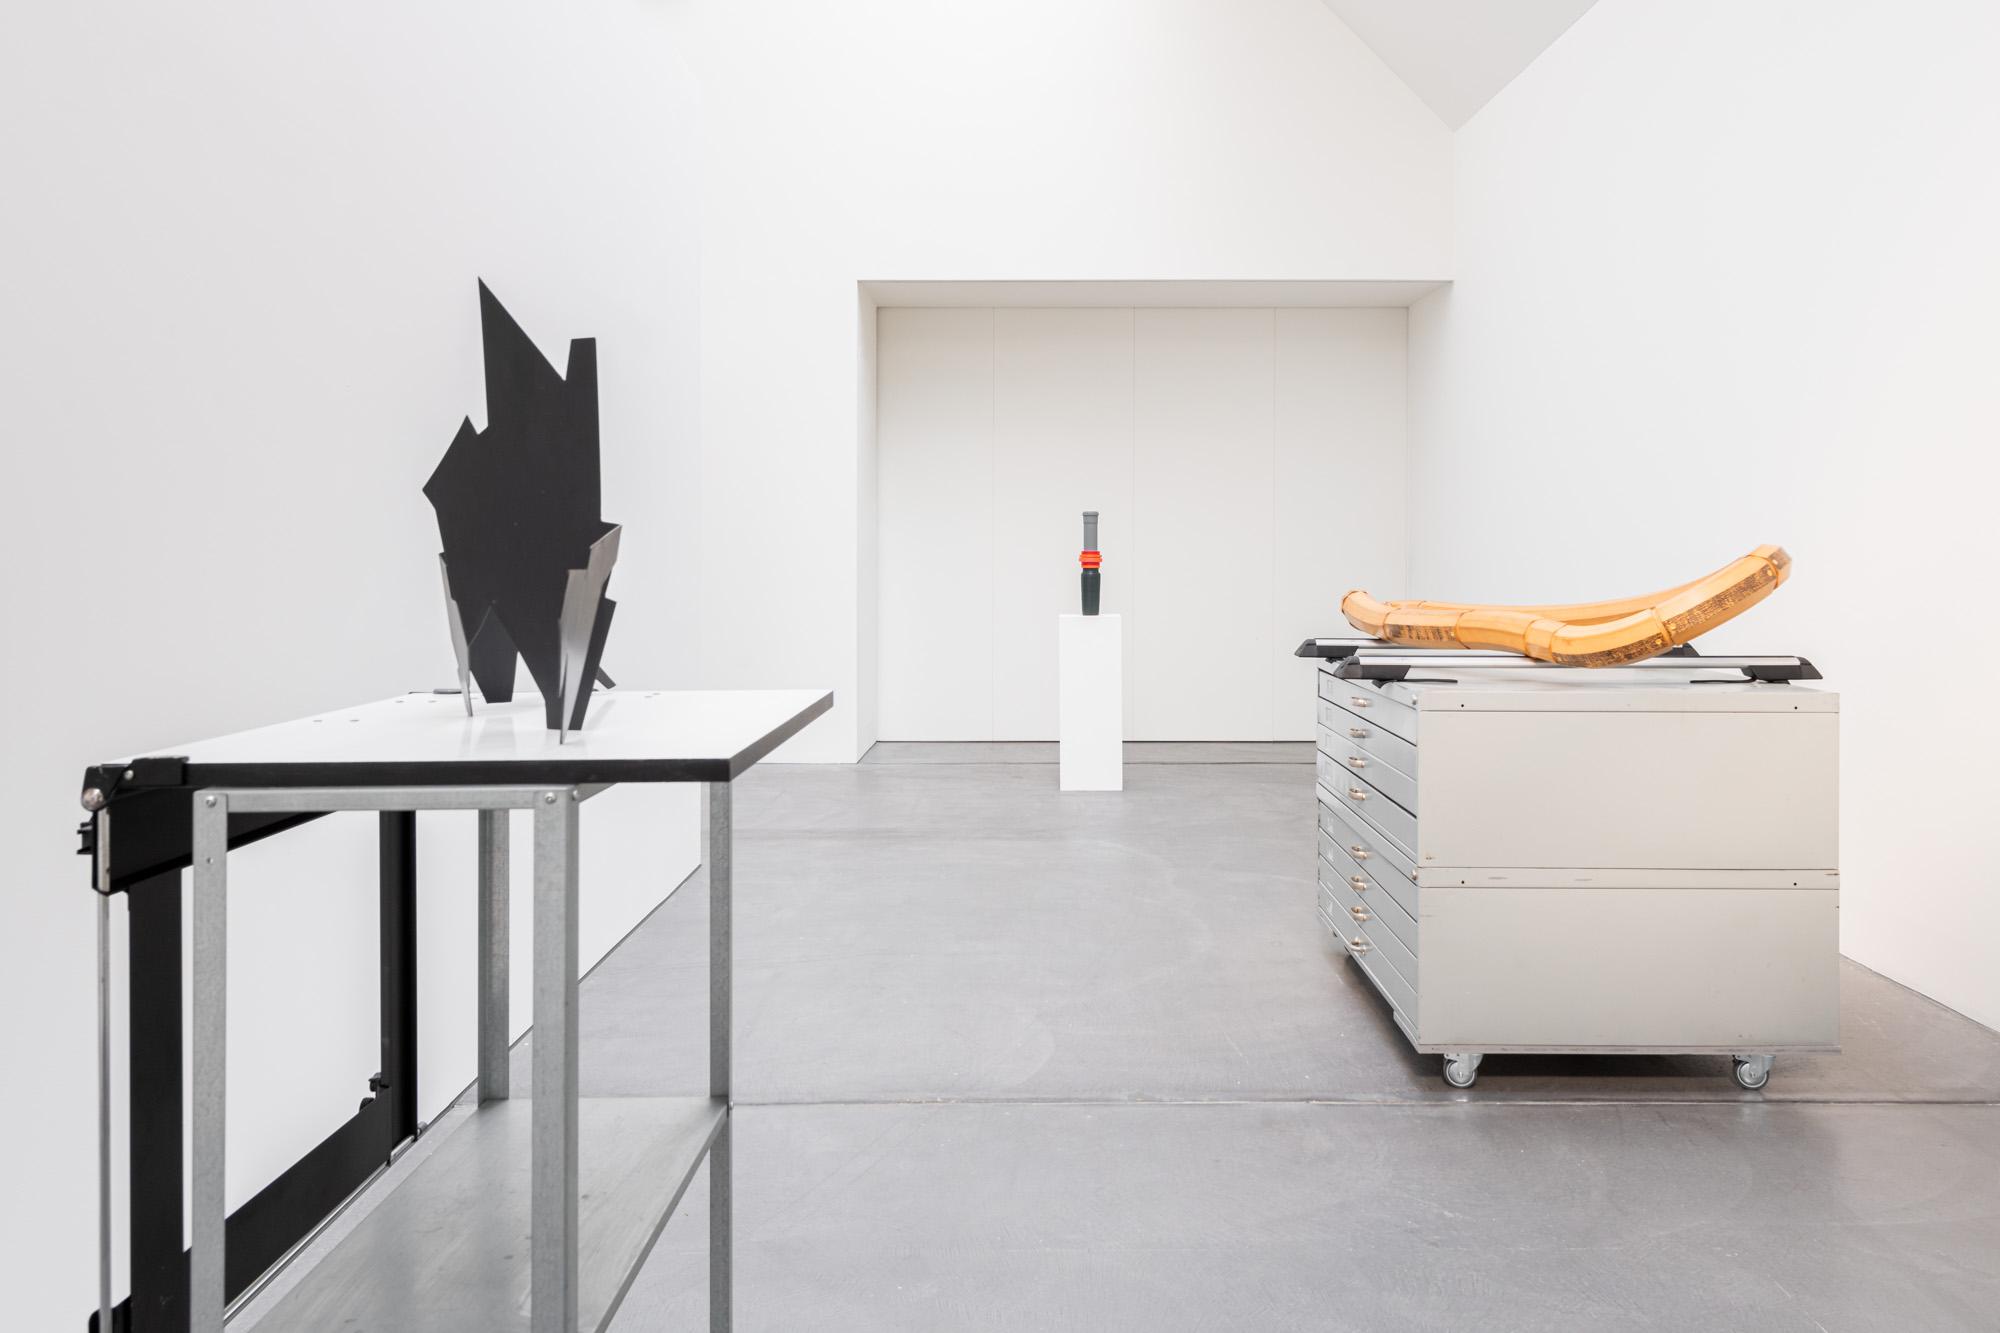 Event: Viewing Room - Florian Slotawa